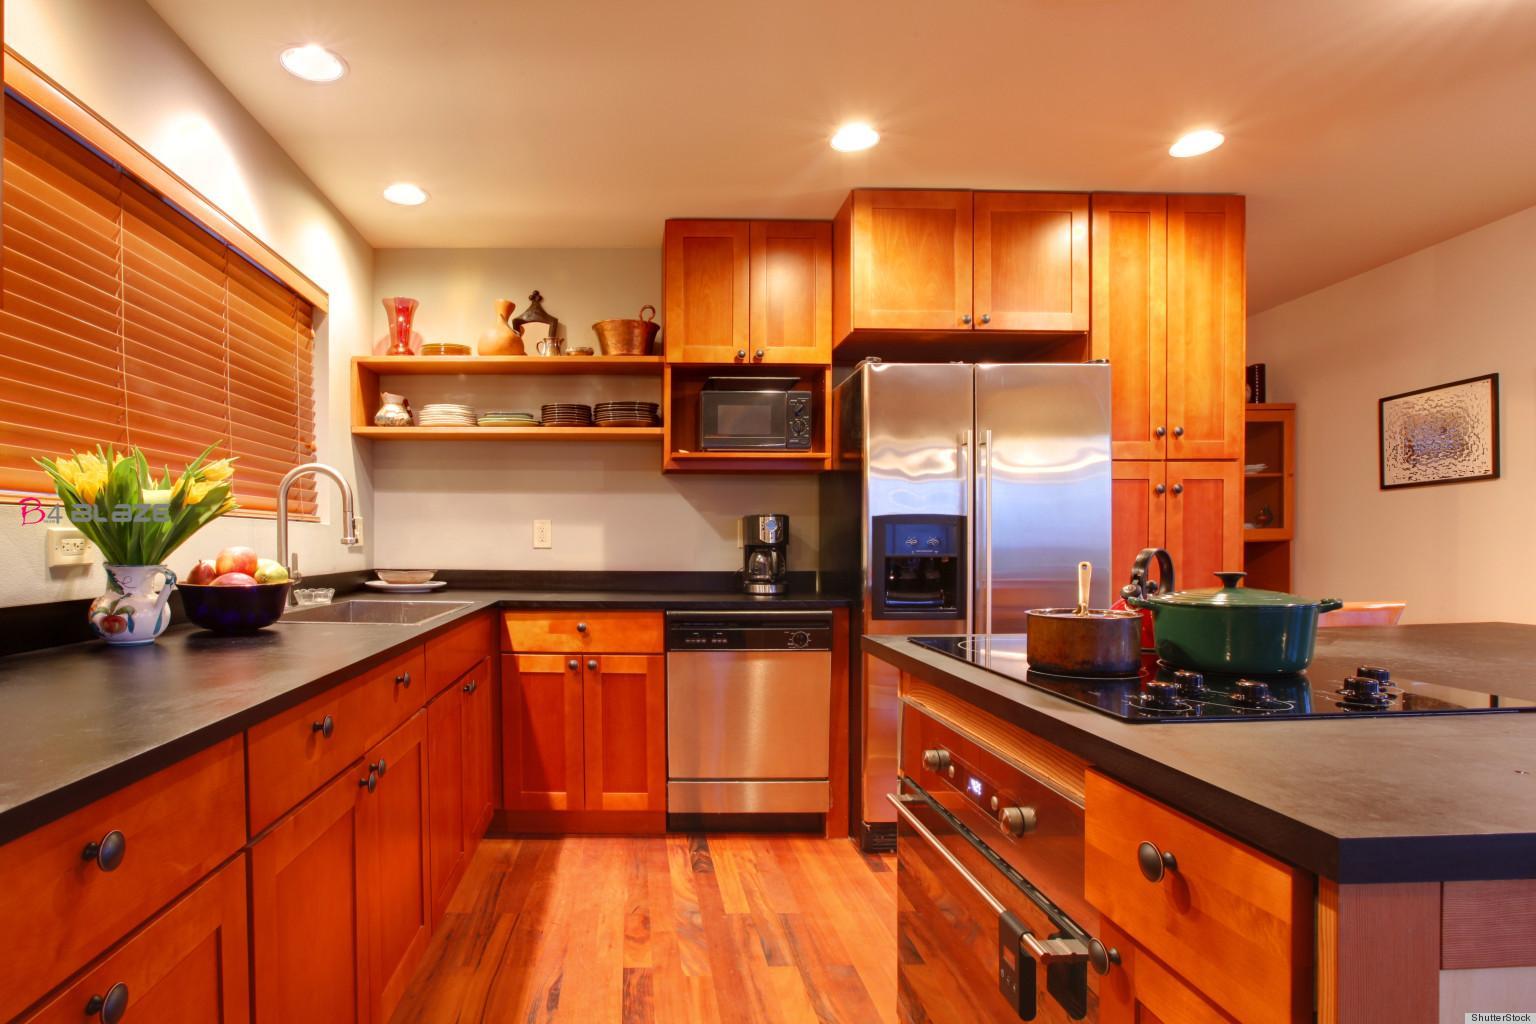 Clean Kitchen Images 3